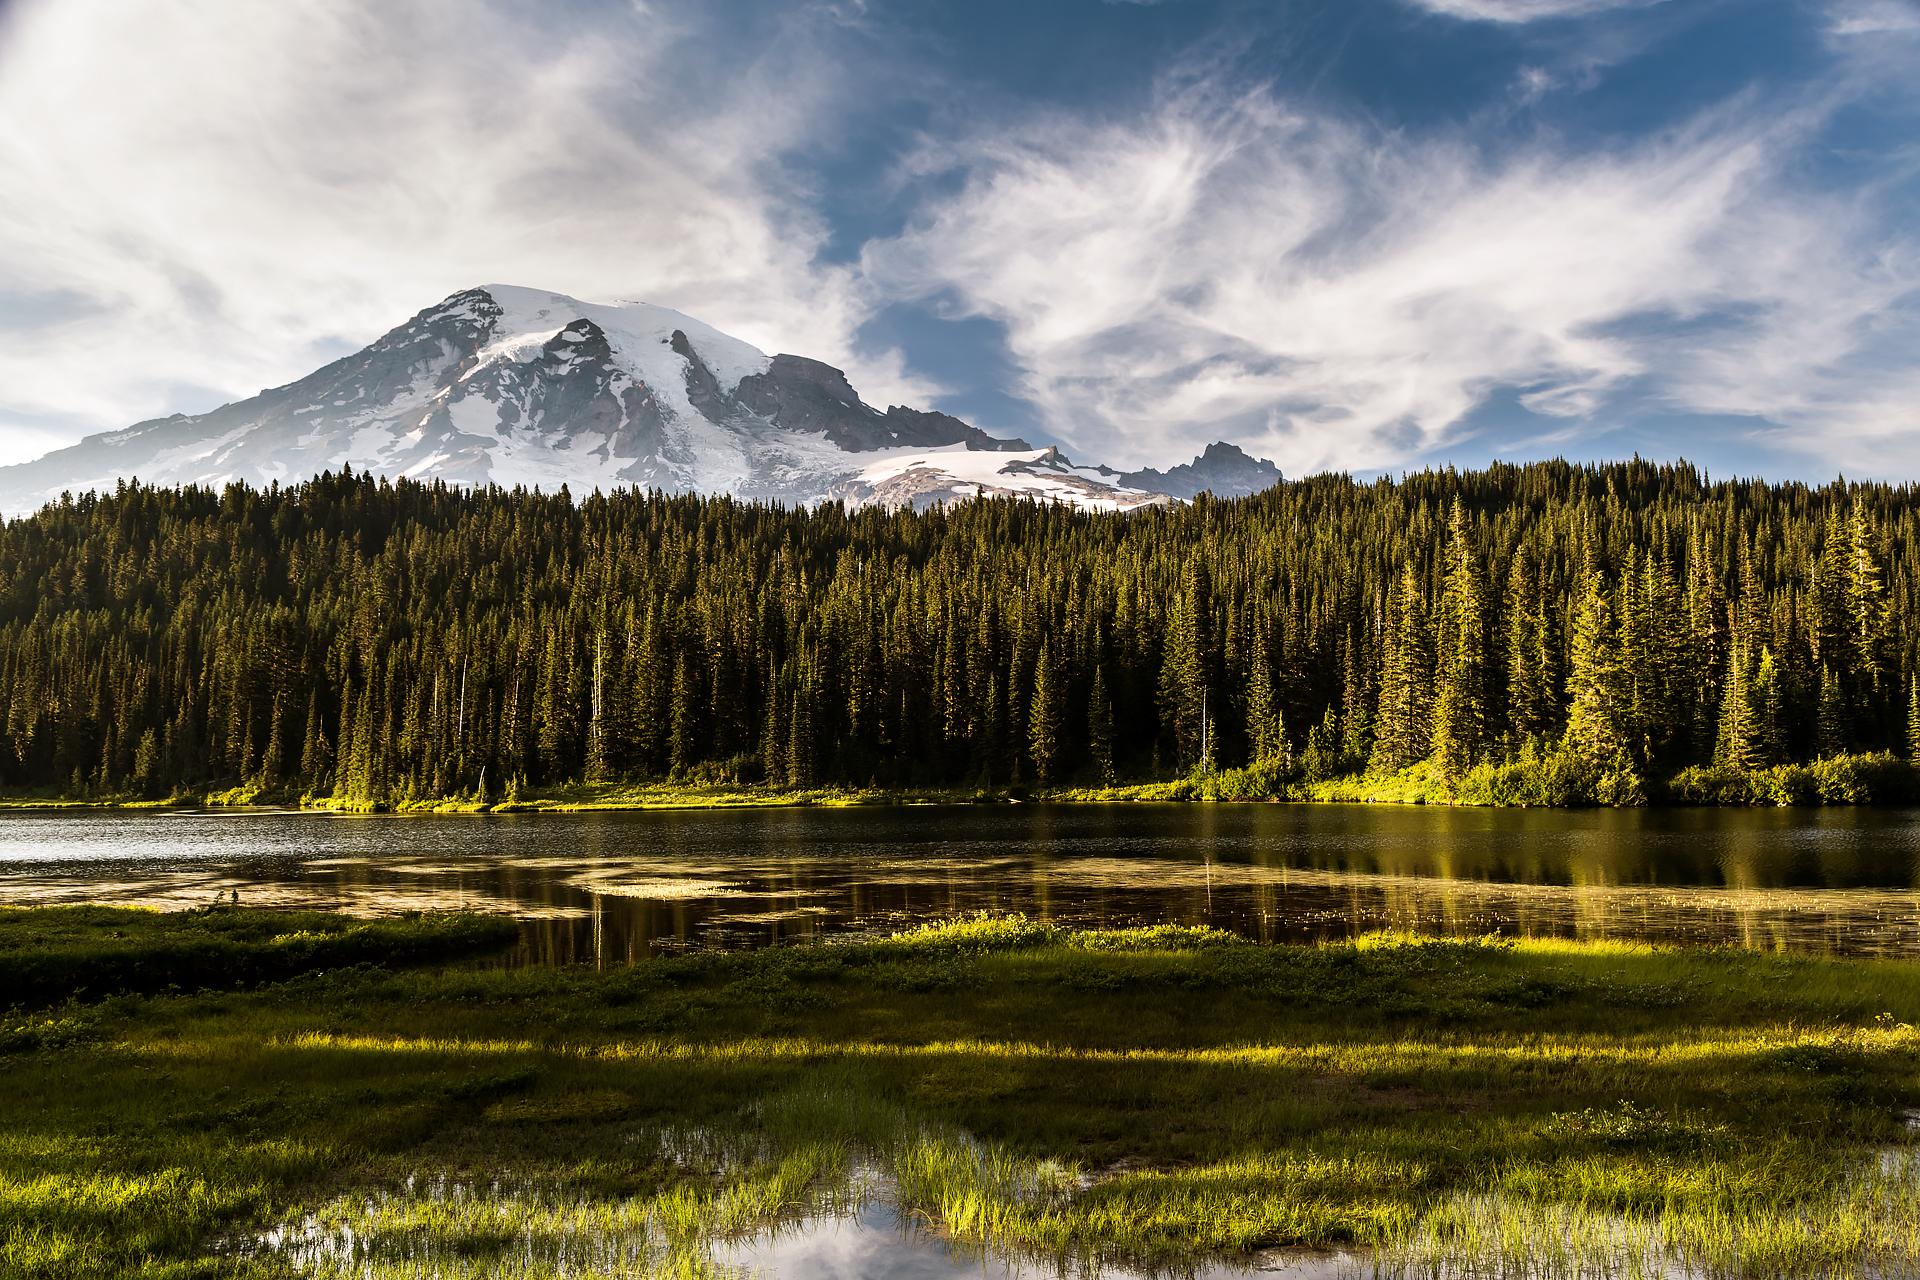 20130821-Mount-Rainier-Day-1-034.jpg